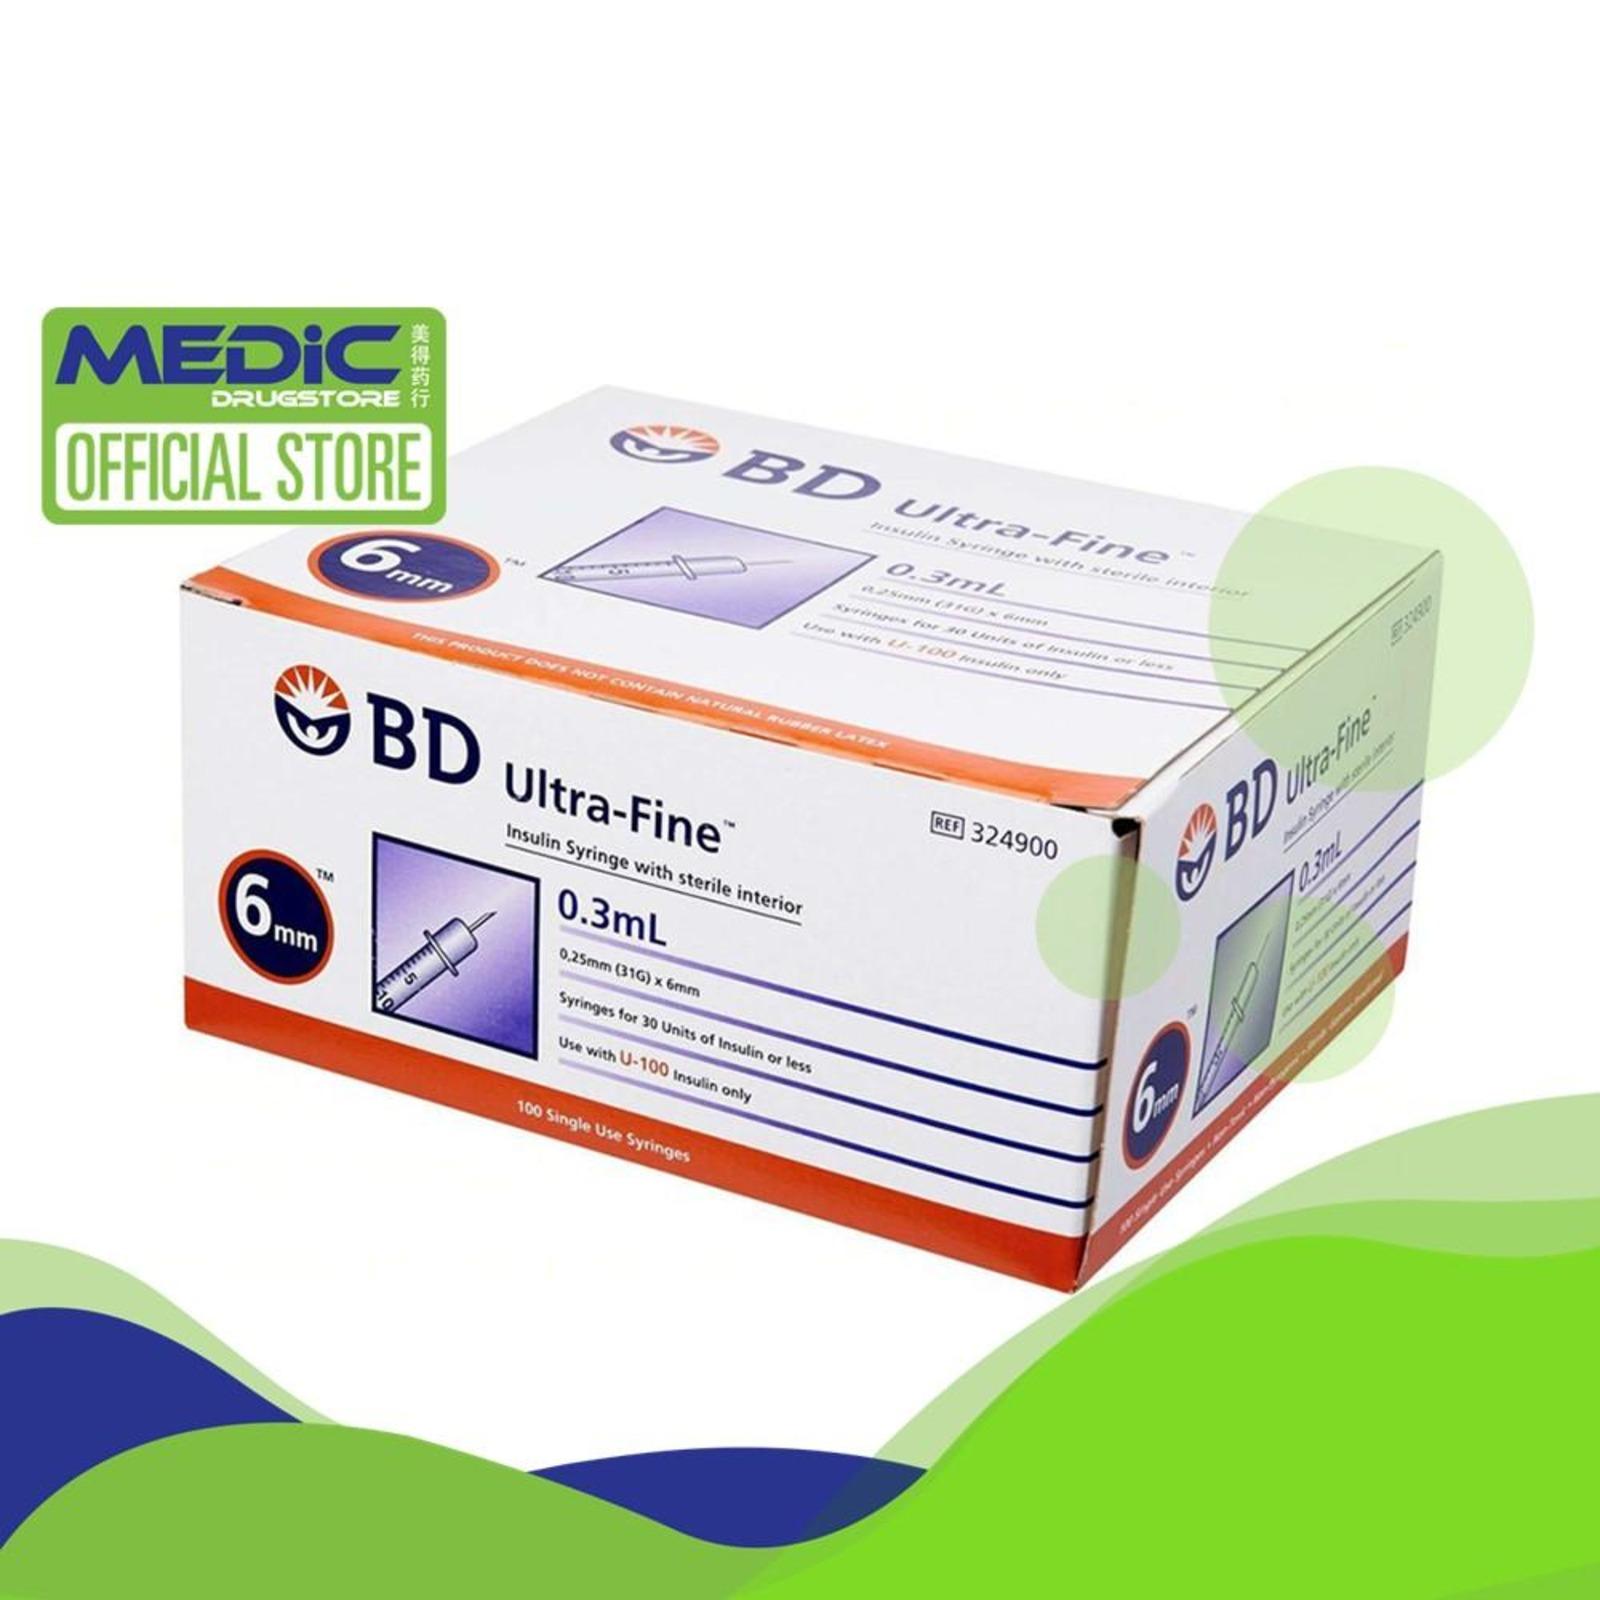 BD Ultra-Fine Insulin Syringe 0.3mL 0.25mm (31G) x 6mm